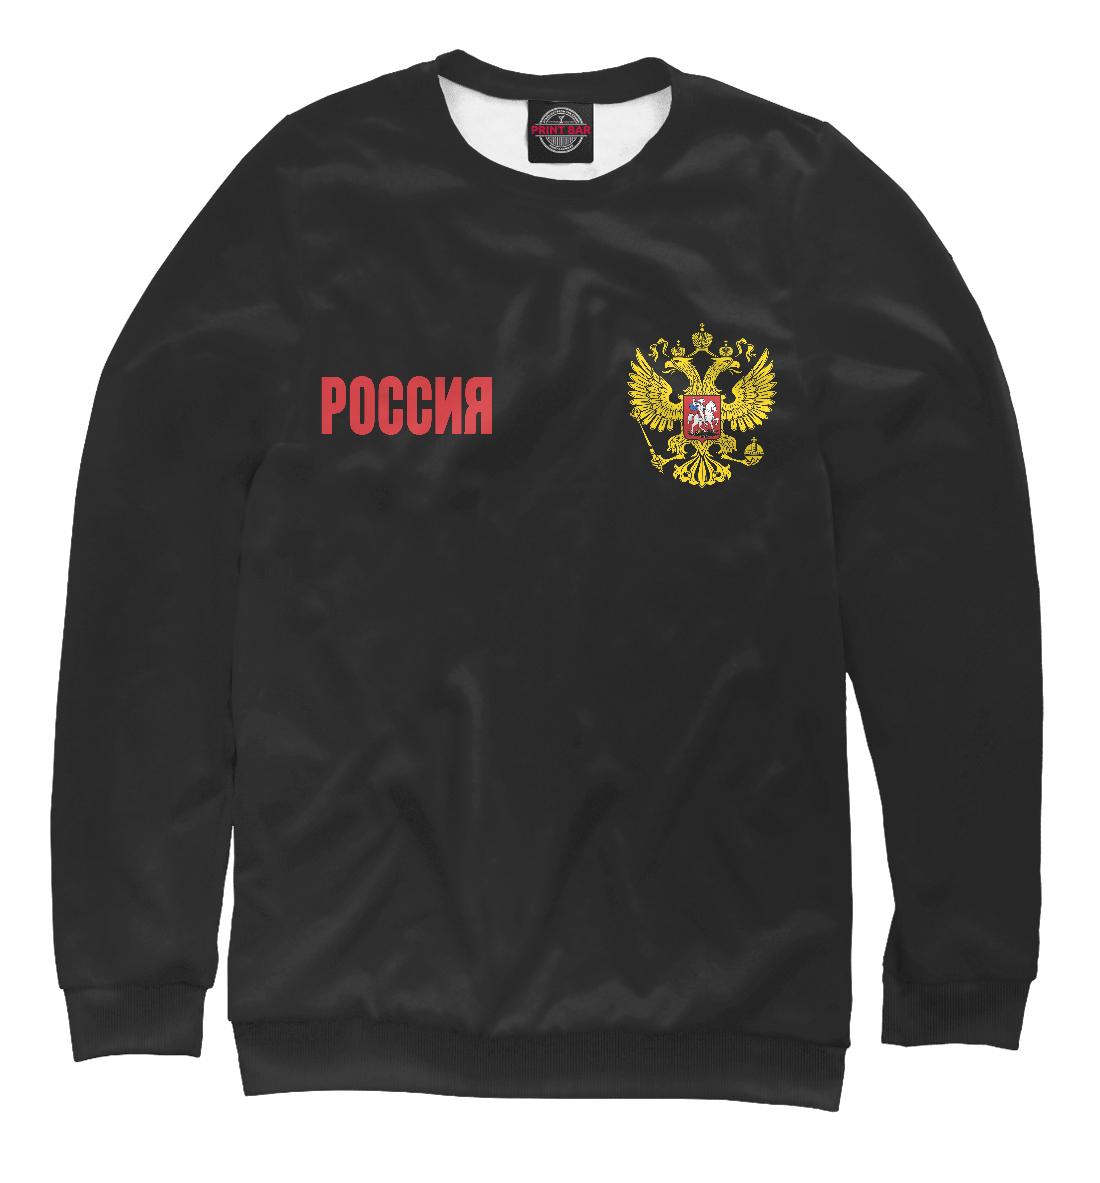 Купить Россия Герб, Printbar, Свитшоты, SRF-863513-swi-1